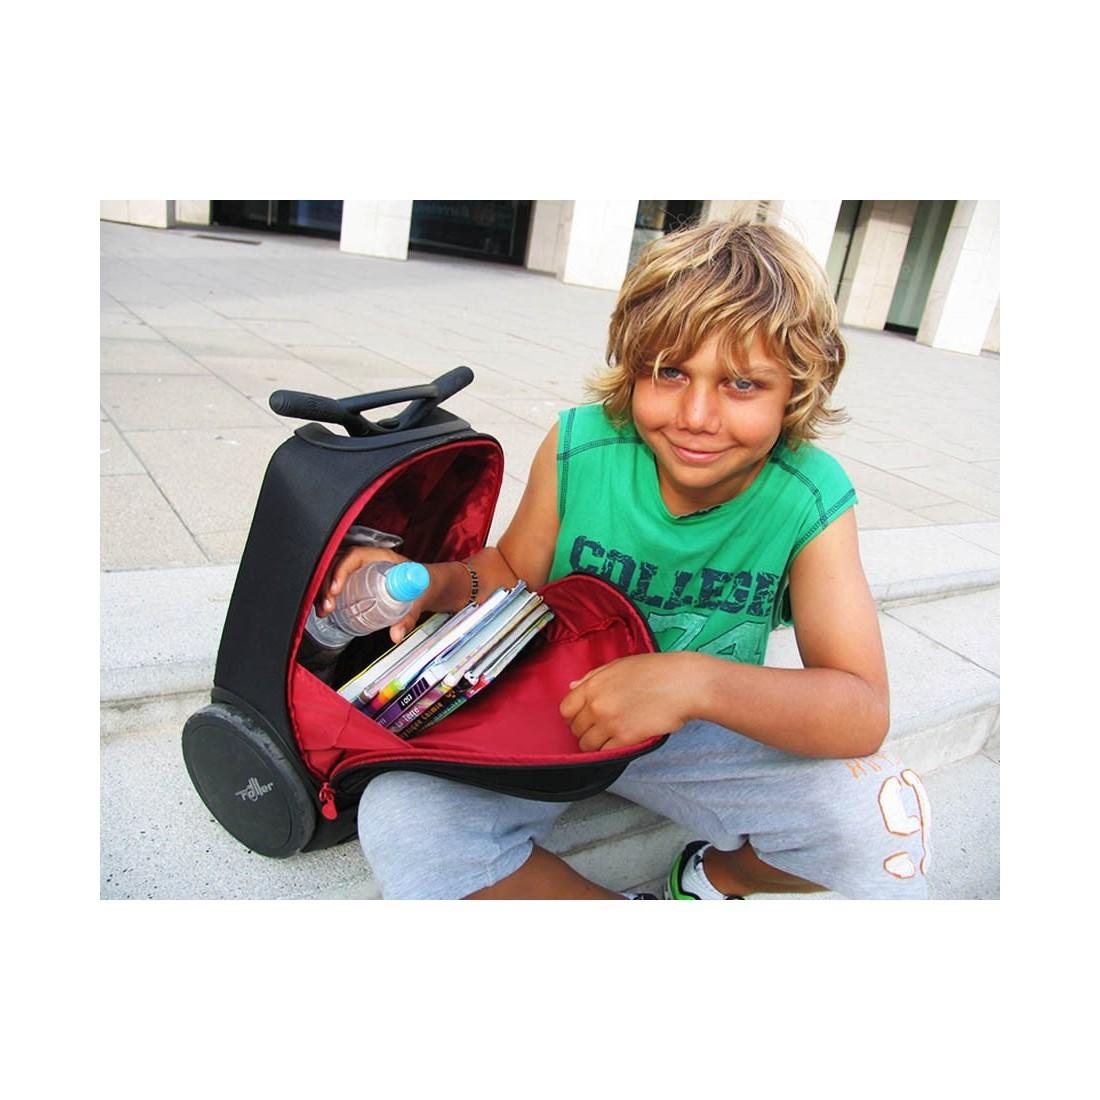 Plecak szkolny na kółkach bez szelek Roller Labirynt dla chłopaka. - plecak-tornister.pl